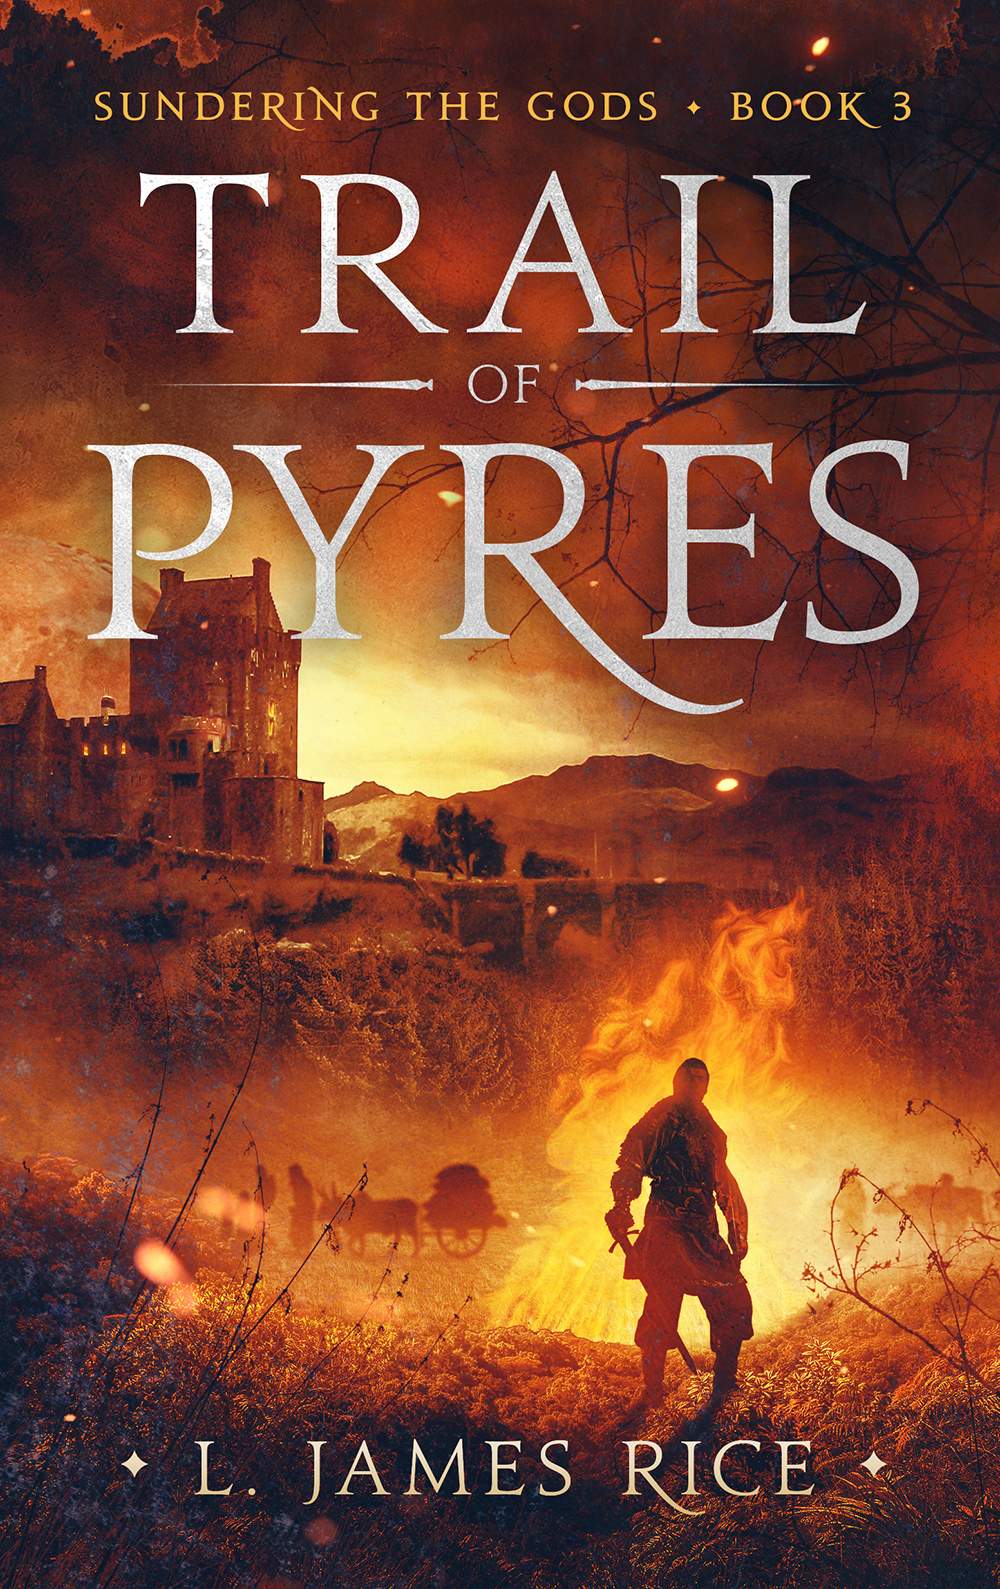 Trail of Pyres Sundering the Gods - EFFy Sized.jpg